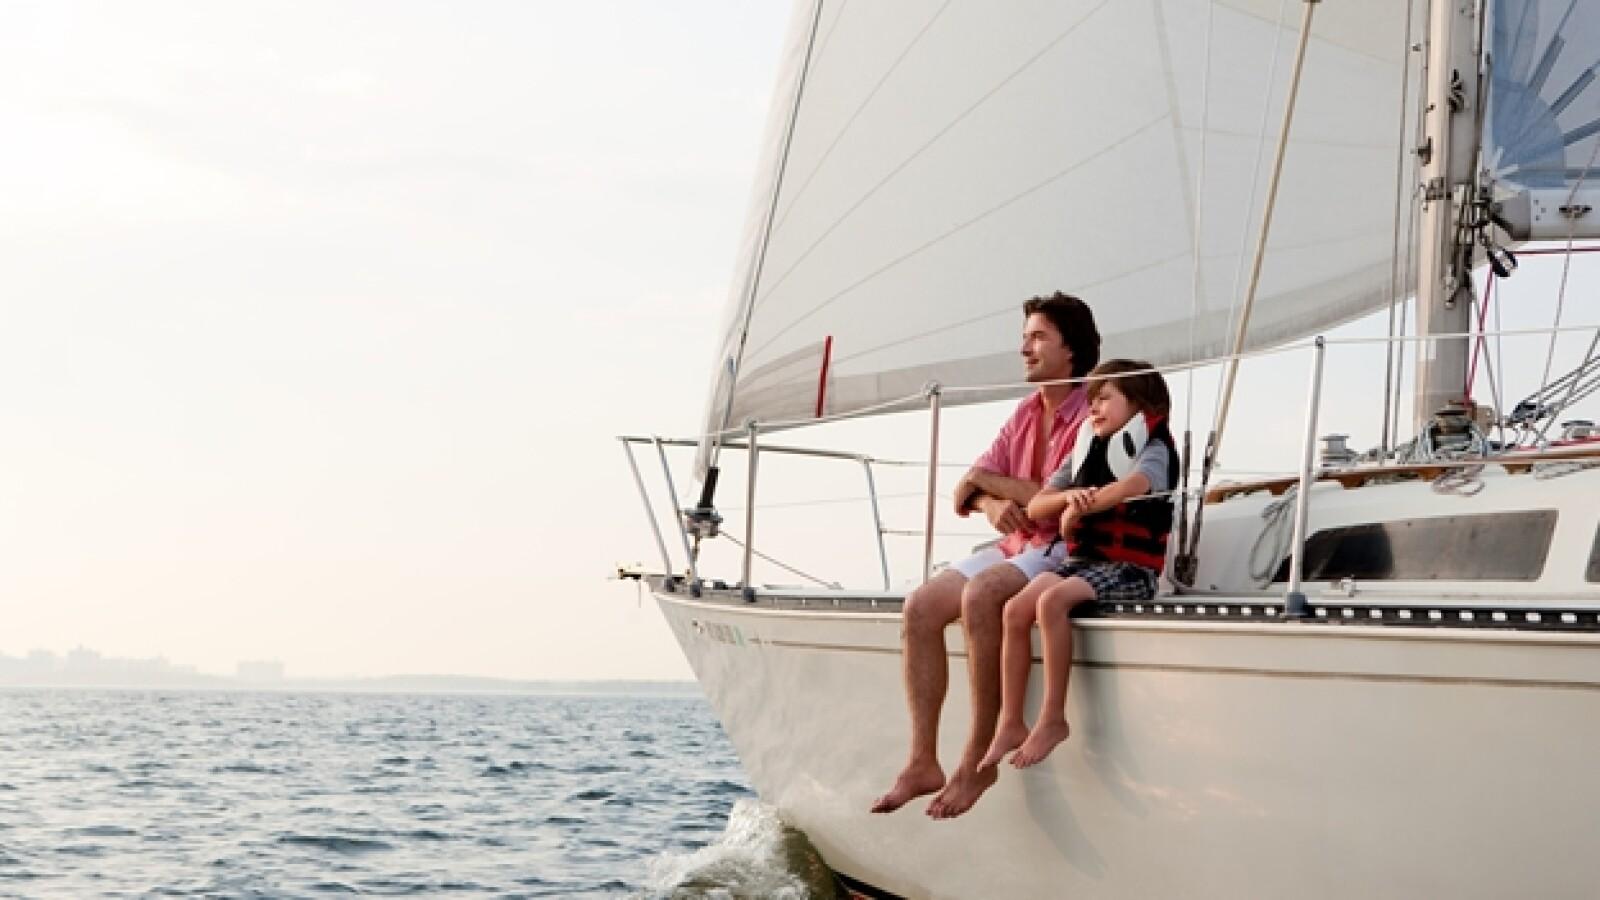 nino yate bote vacaciones mar